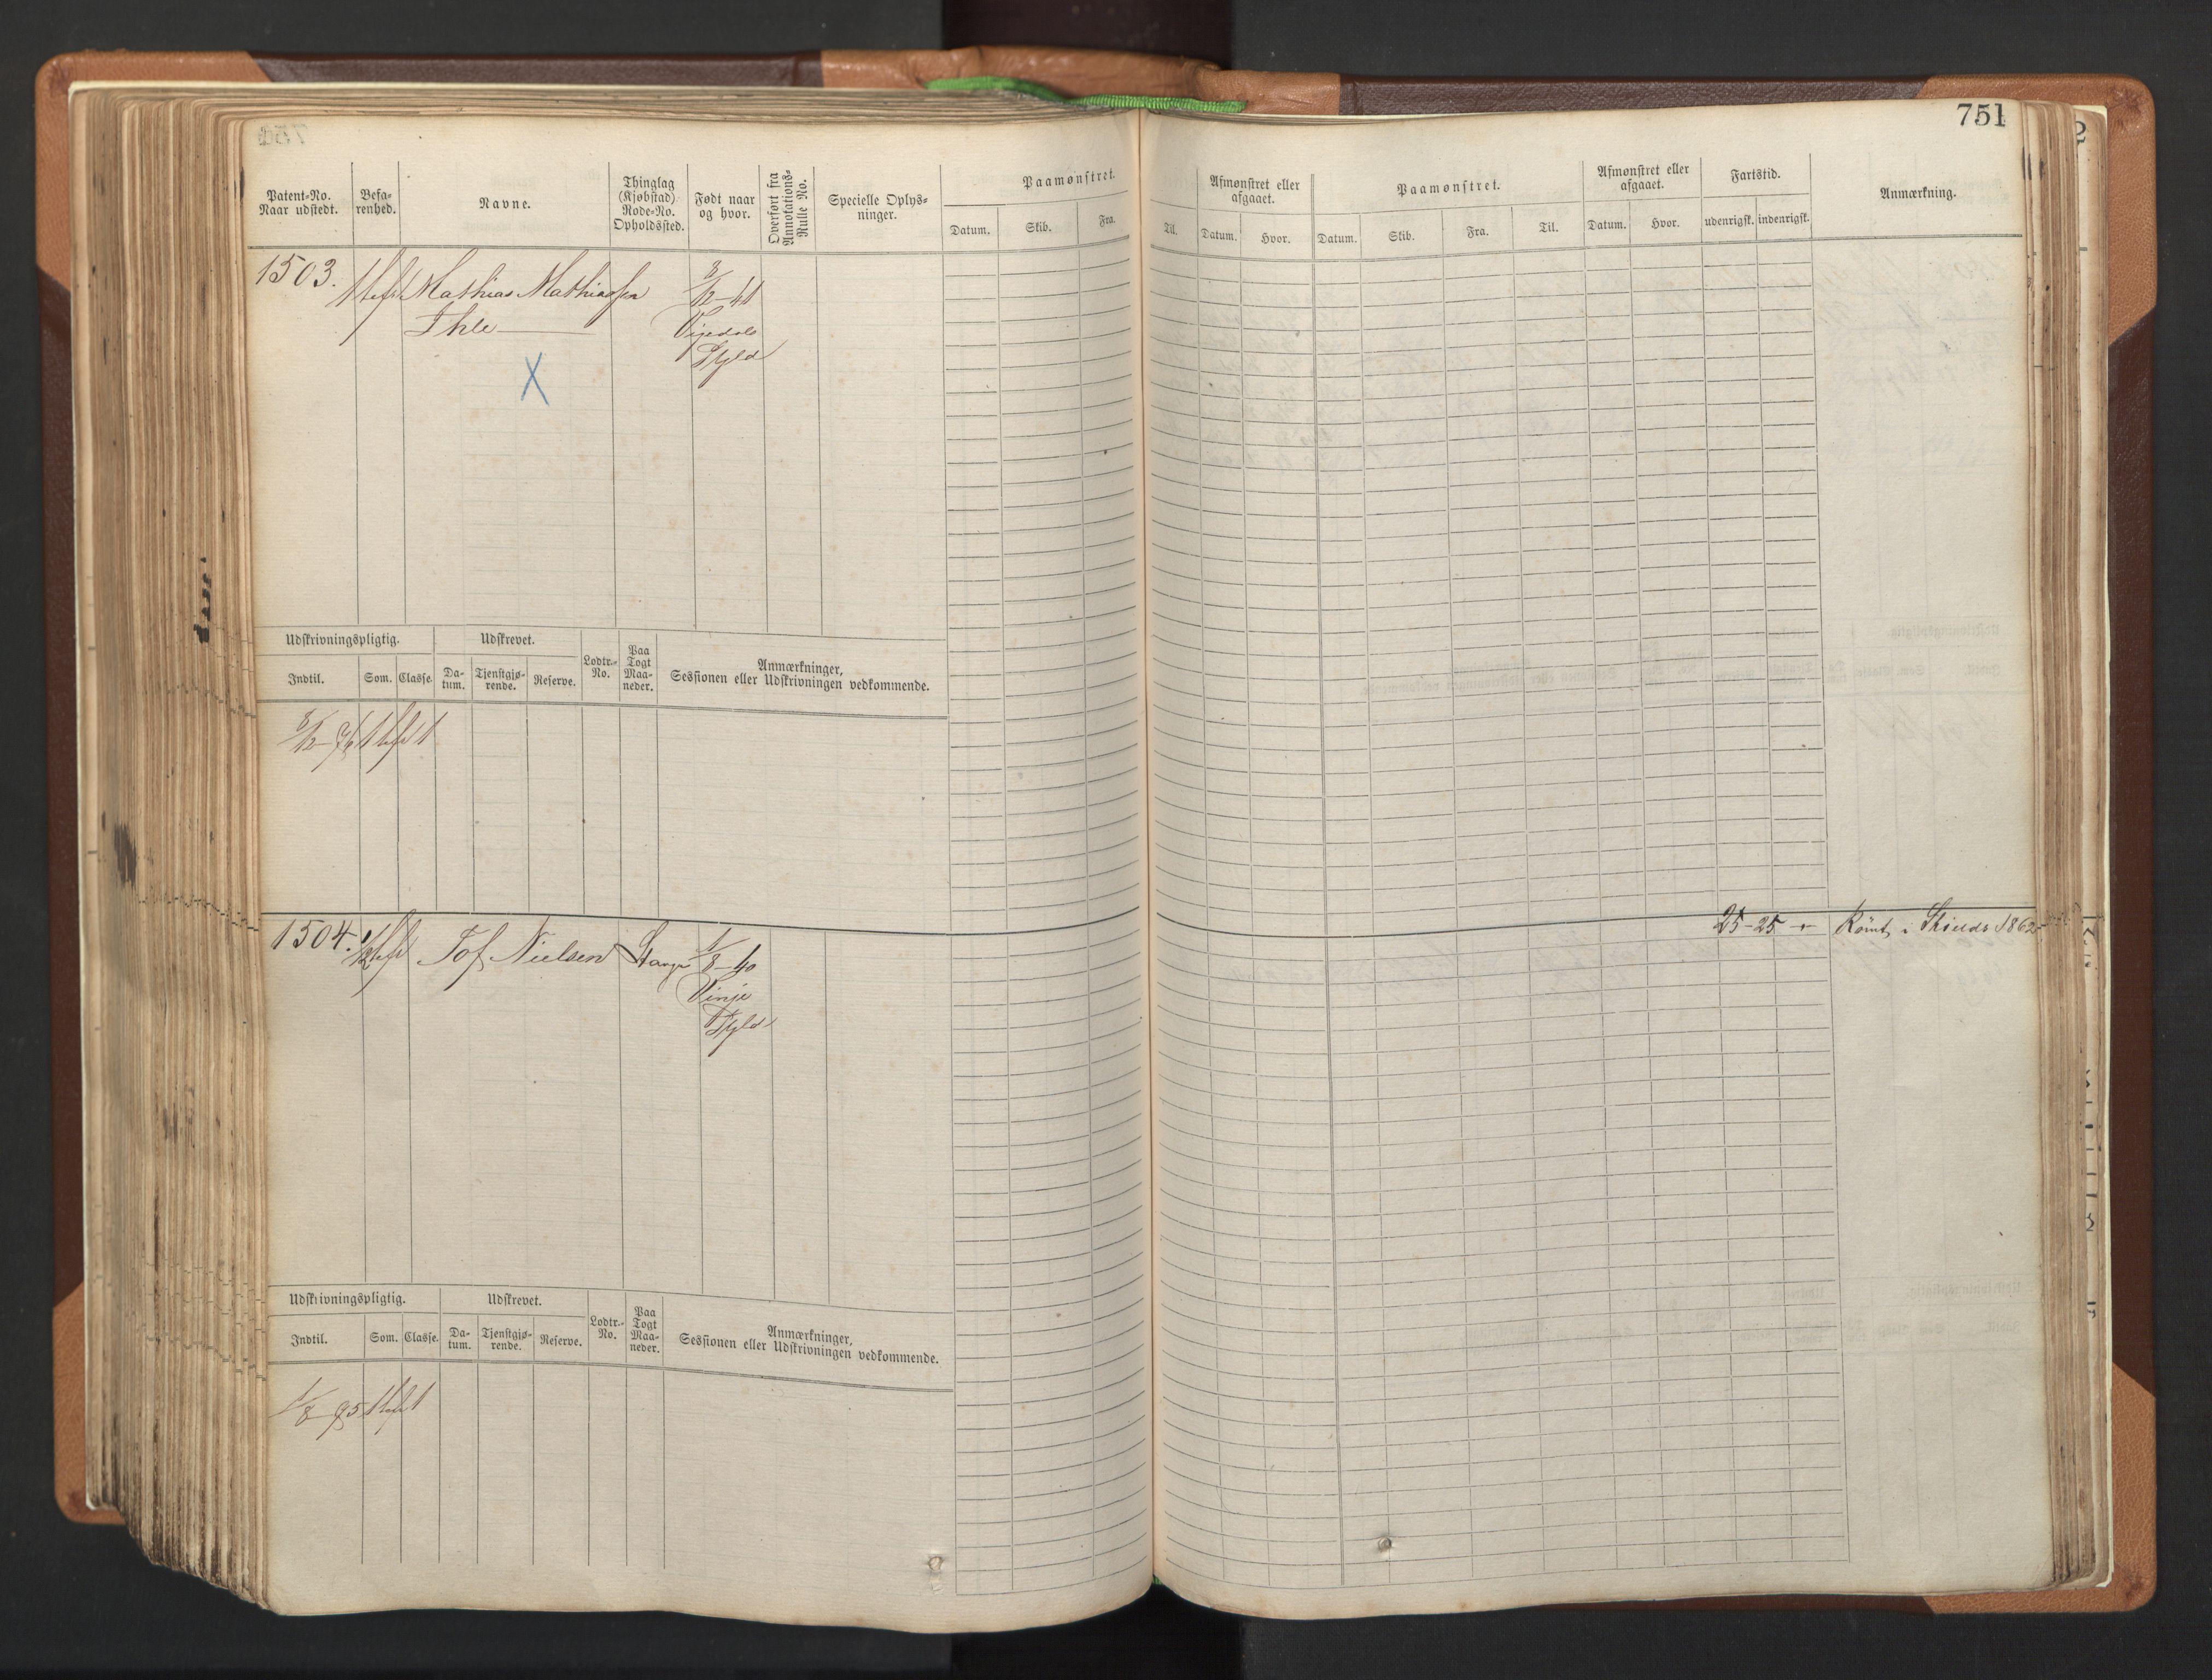 SAST, Stavanger sjømannskontor, F/Fb/Fbb/L0005: Sjøfartshovedrulle, patentnr. 793-1606 (del 2), 1869-1880, p. 363